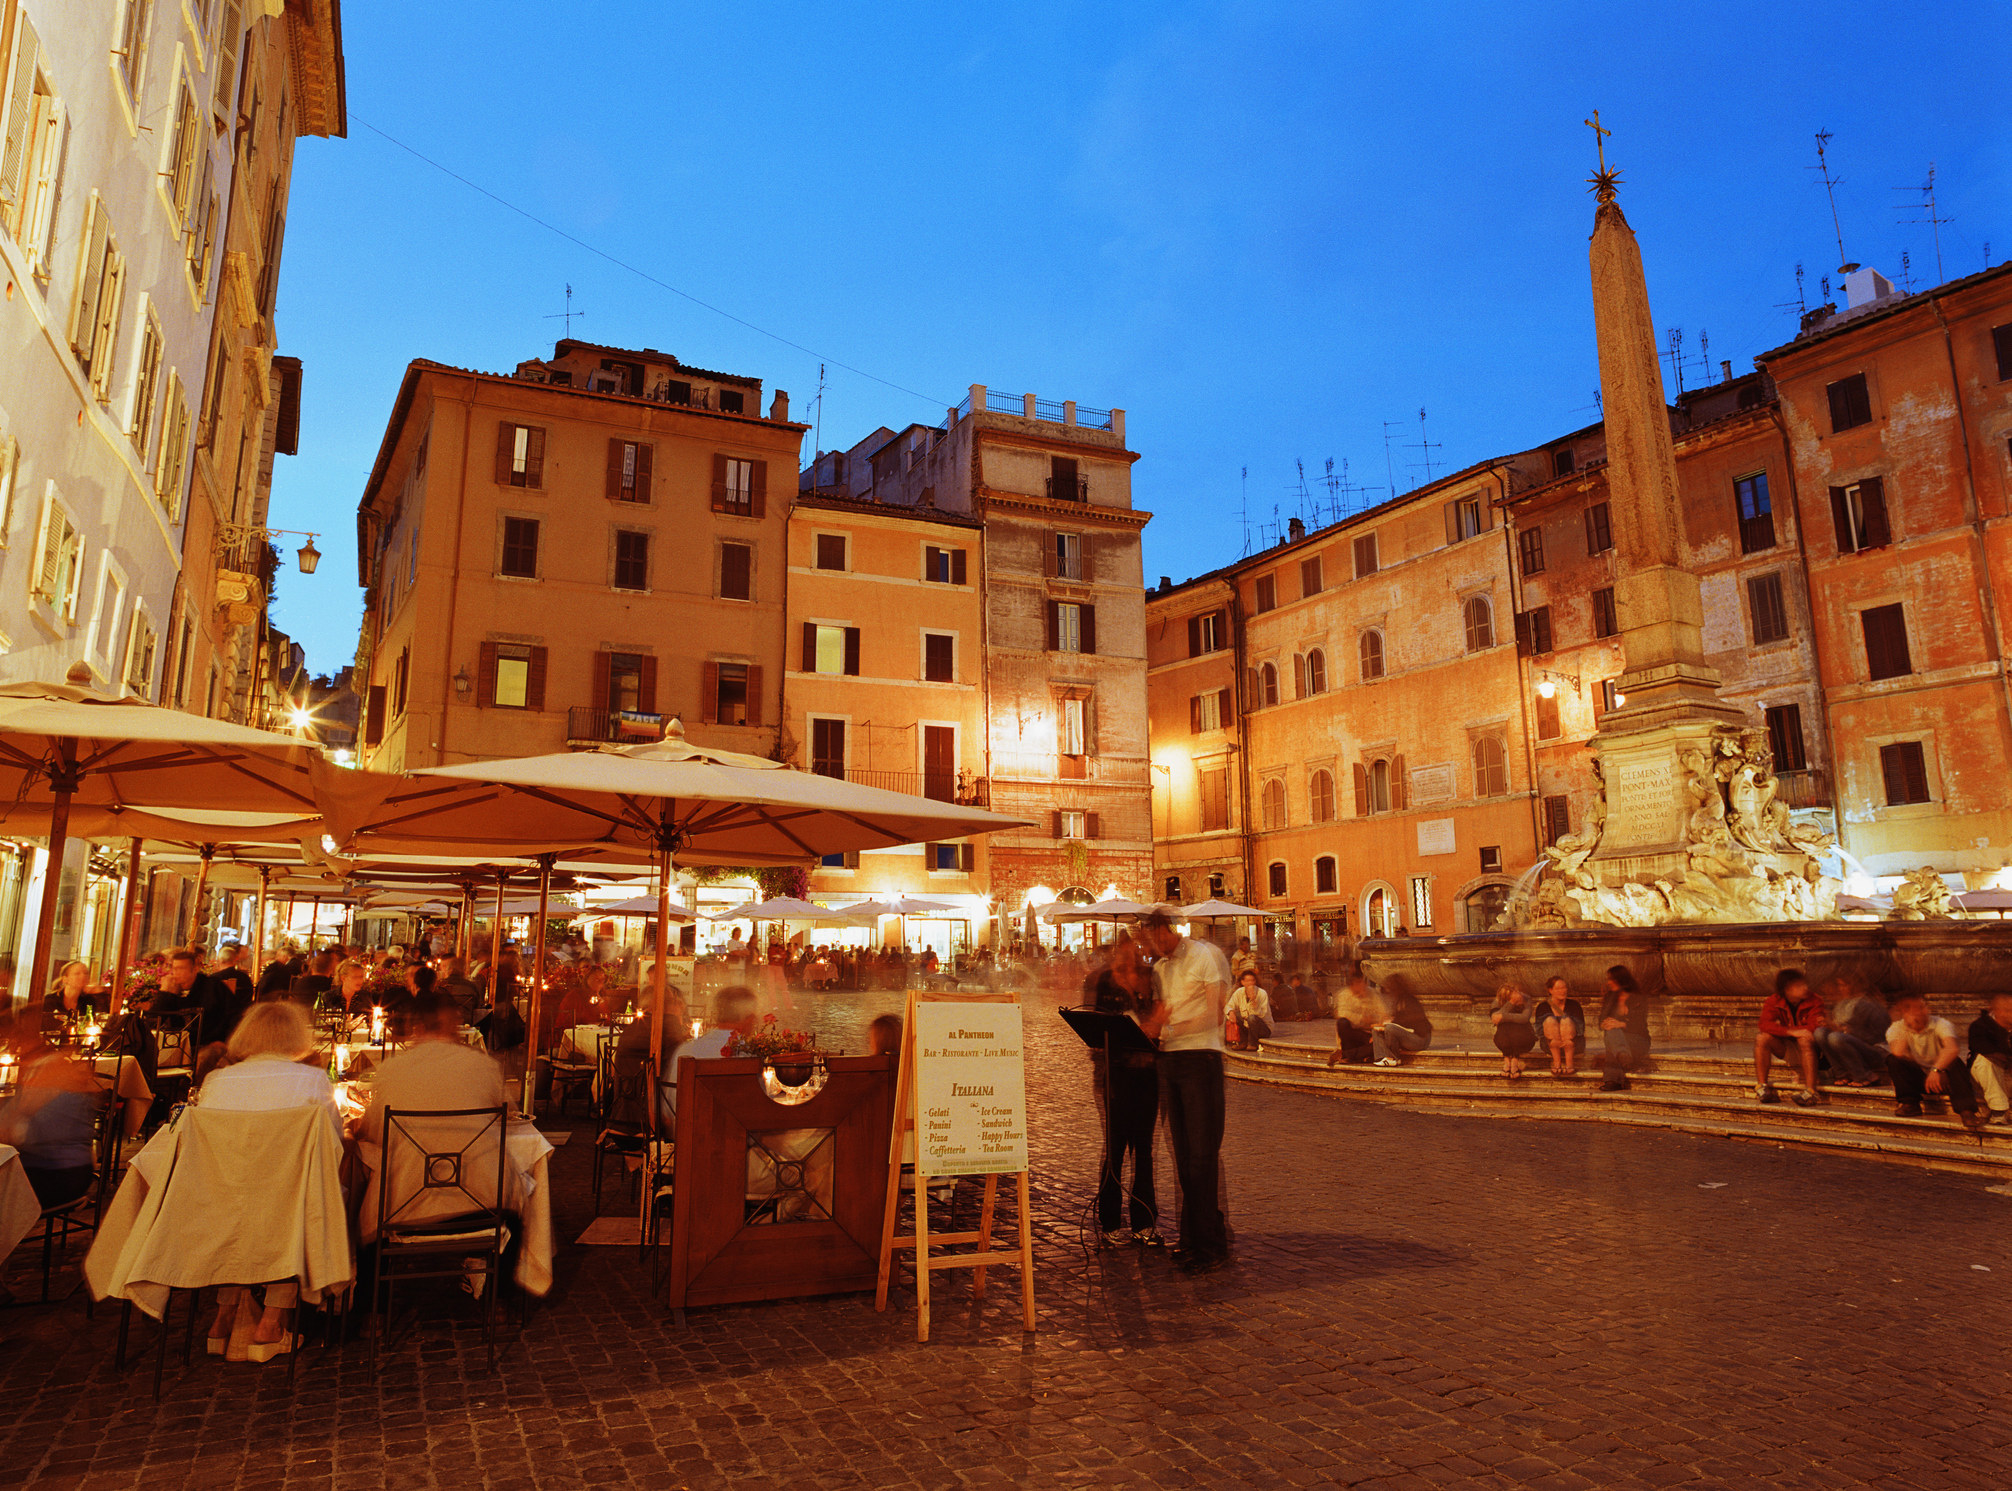 A busy restaurant in an Italian plaza.